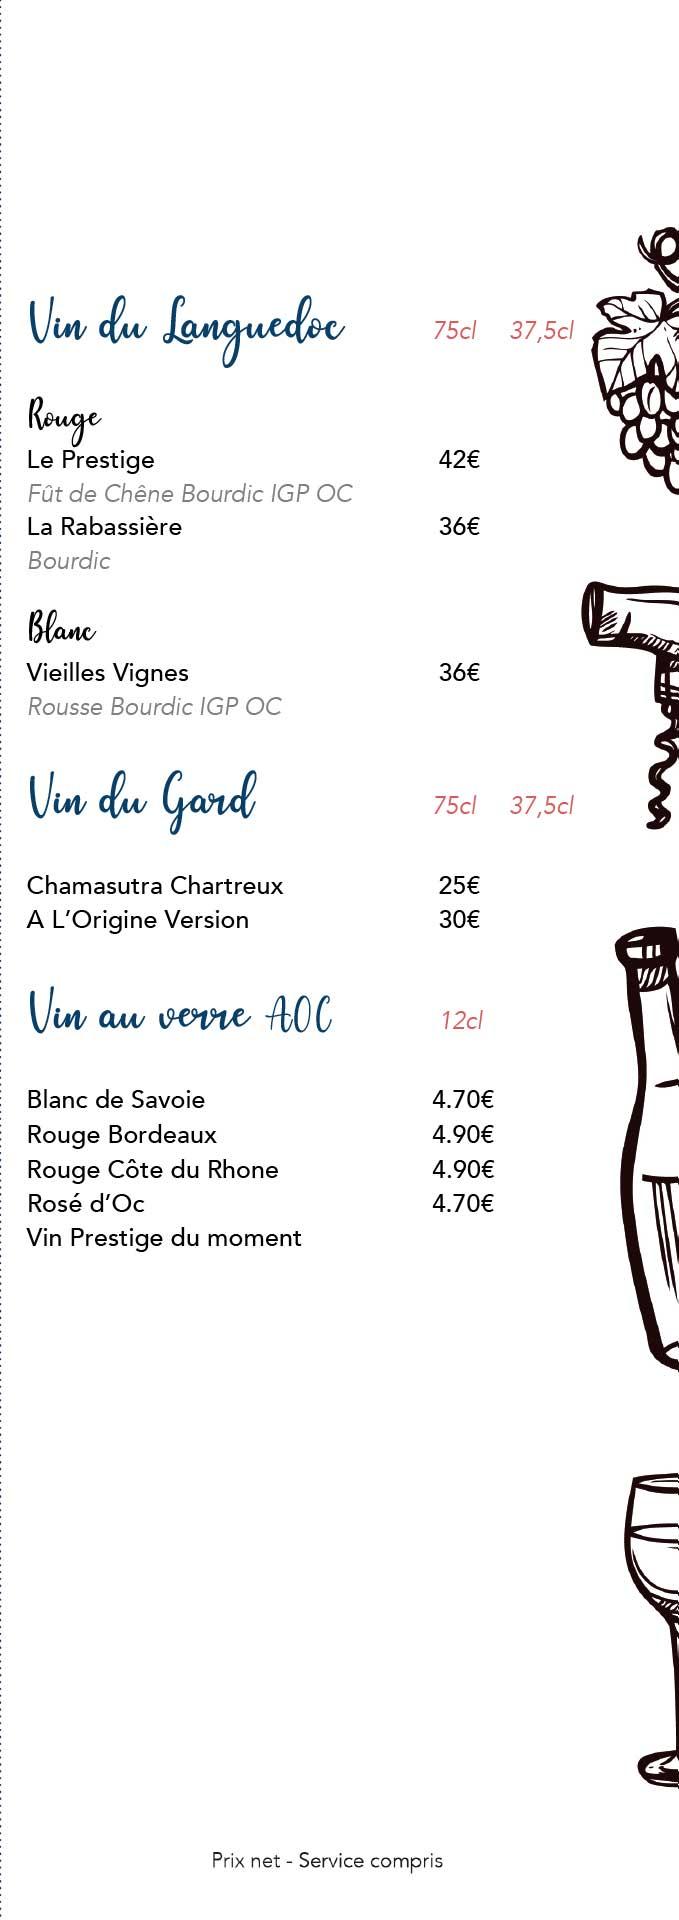 carte-vin-6-restaurant-cote-brune-hiver-2020-2021